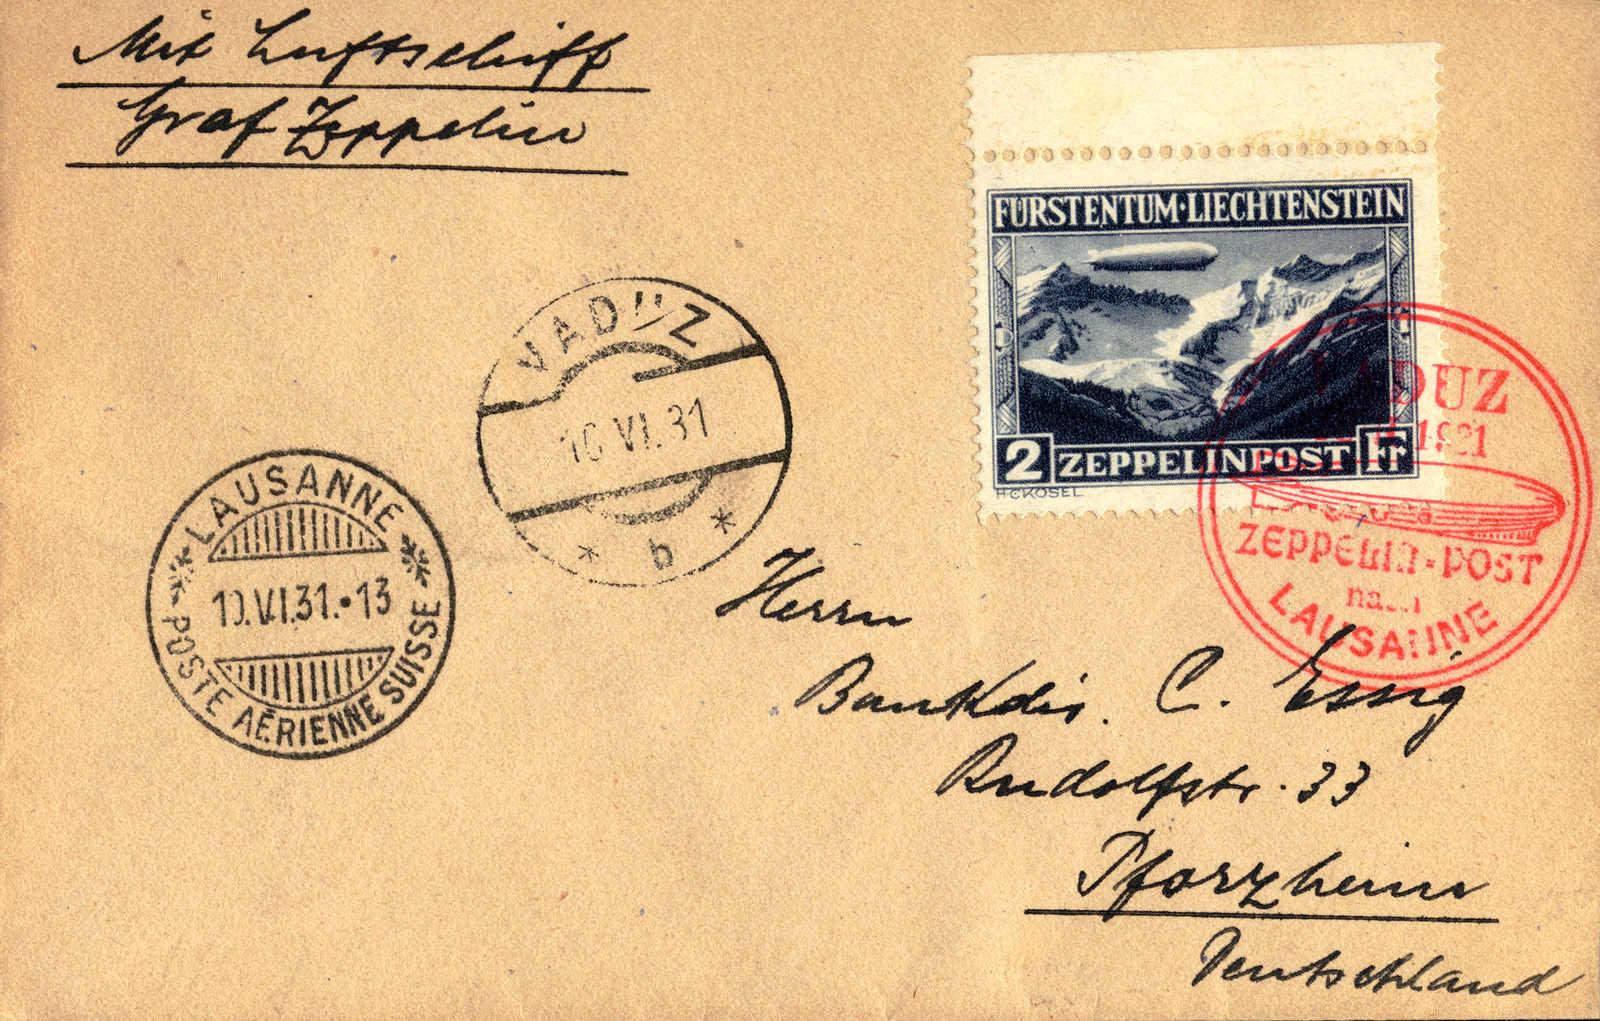 Lot 10107 - europe Liechtenstein -  classicphil GmbH 3 rd classicphil Auction - VIENNA- AUSTRIA